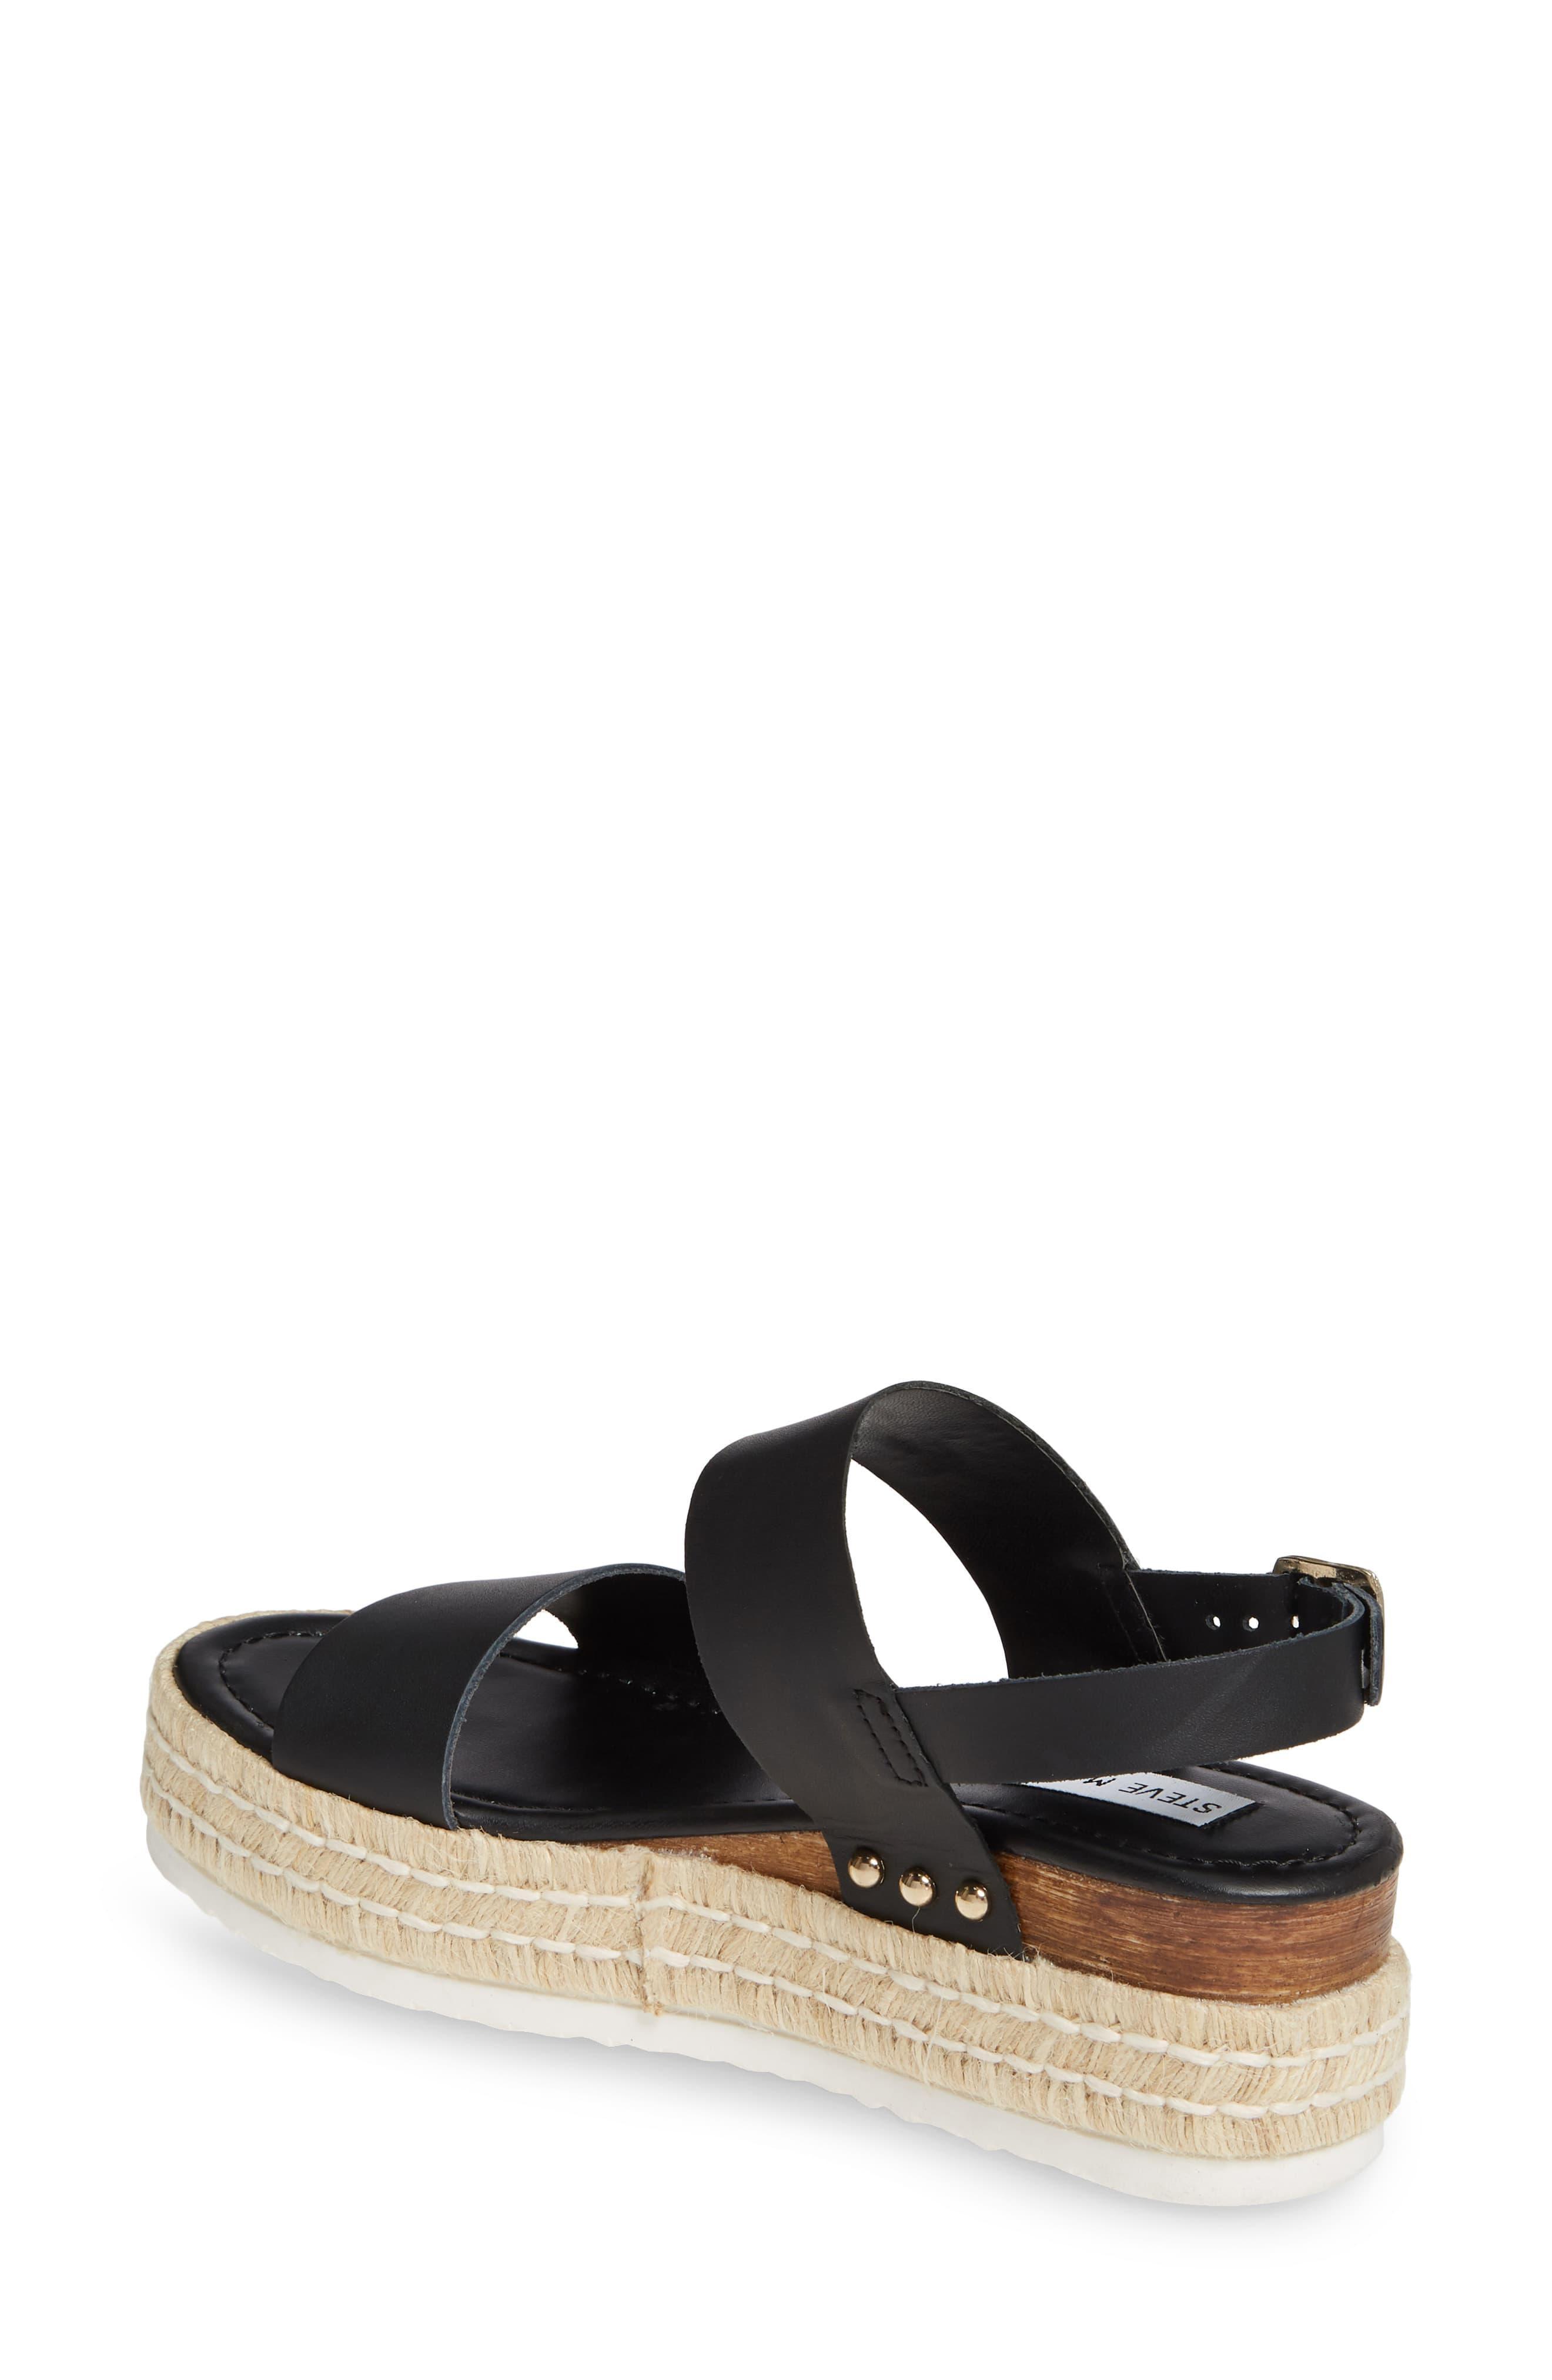 c24822a23fe Women's Black Catia Espadrille Wedge Sandal